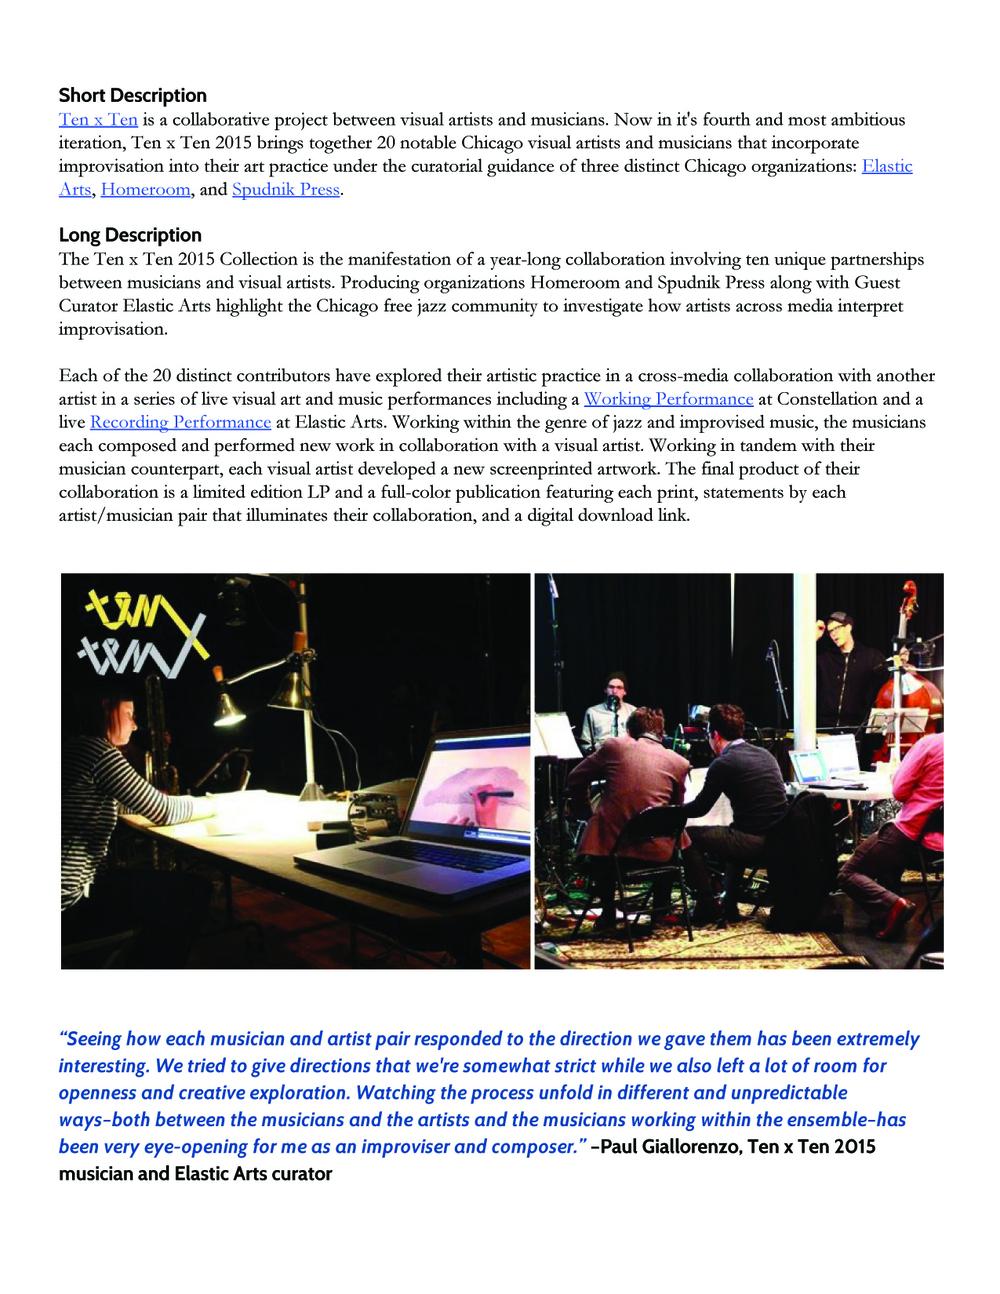 Ten x Ten 2015 Press Release 3/5